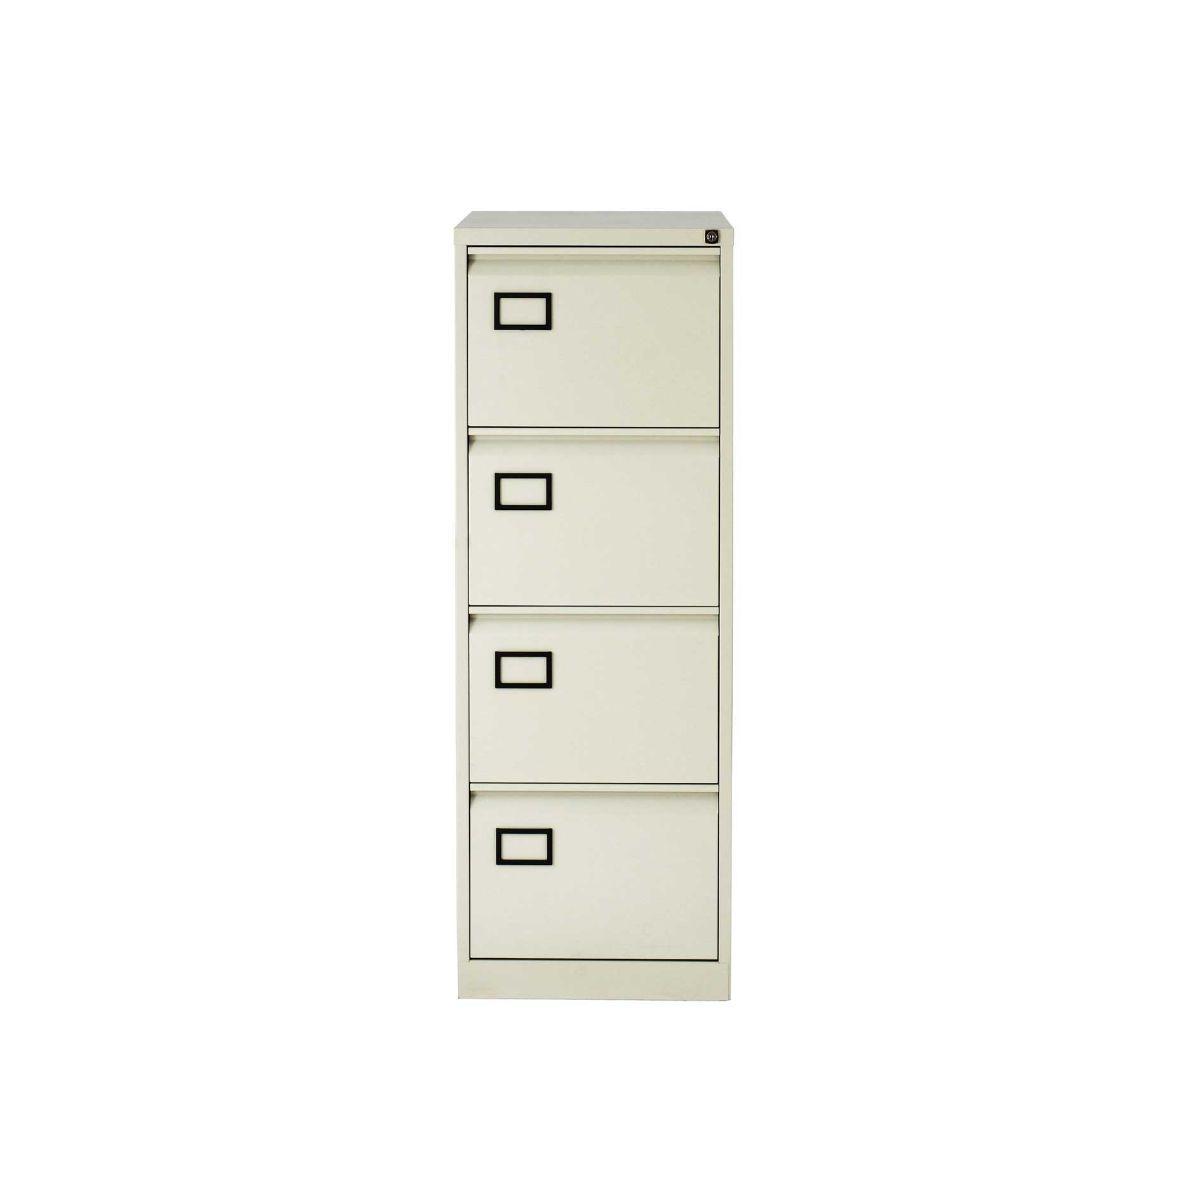 Bisley 4 Drawer Filing Cabinet Foolscap, Grey